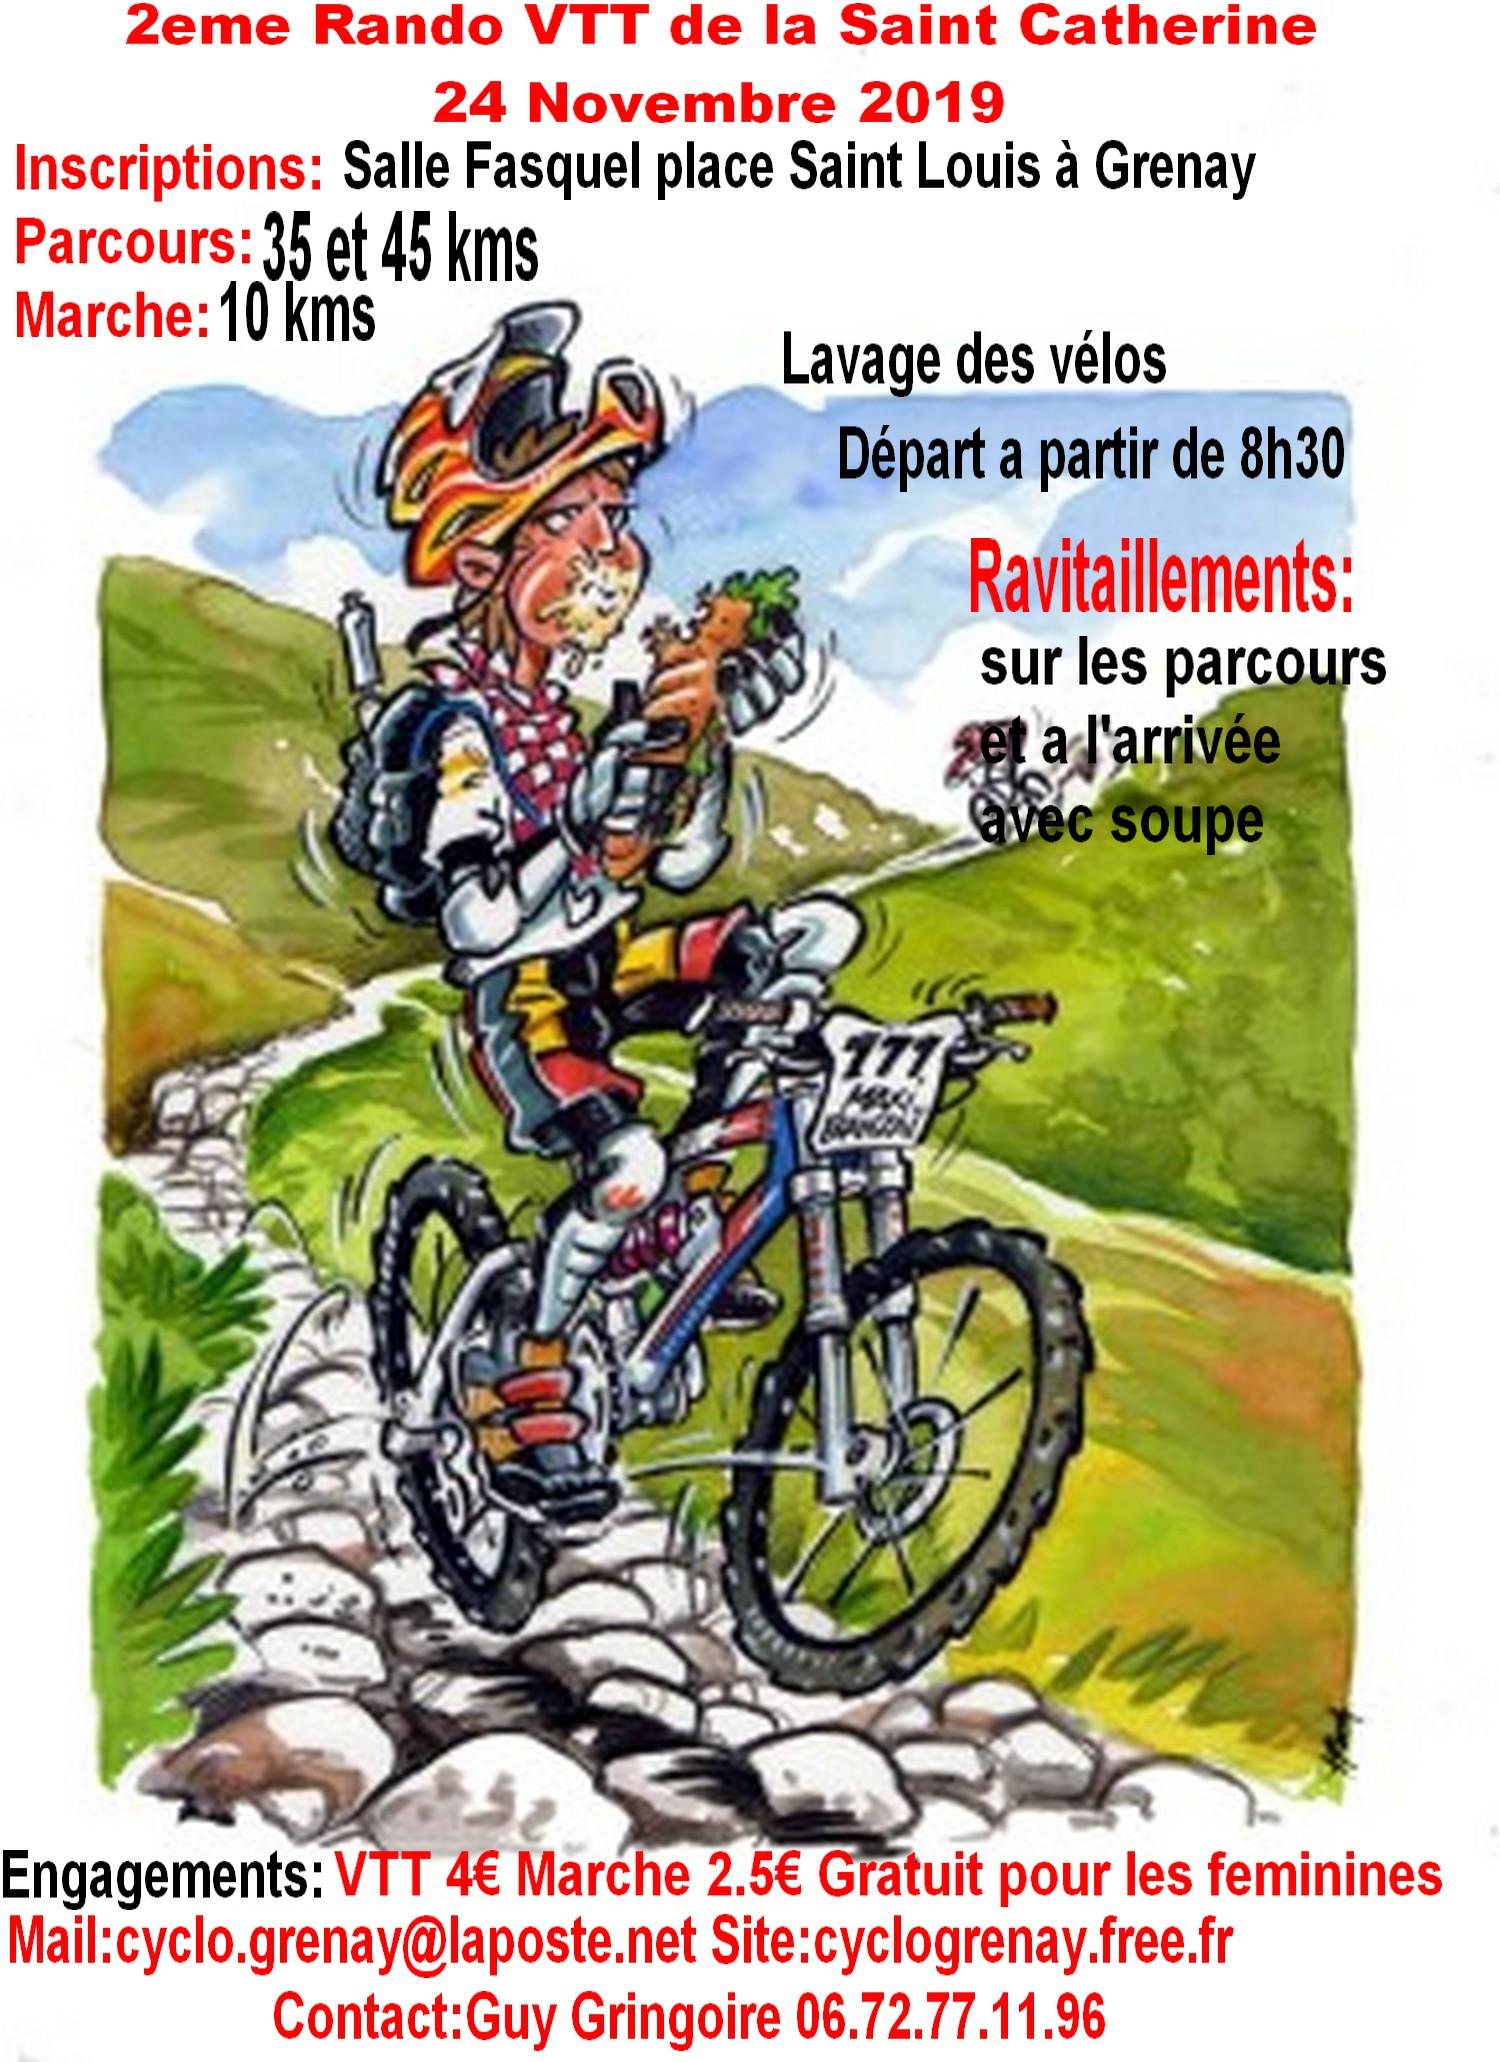 Calendrier Cyclotourisme 2019 Nord Pas De Calais.Bienvenue Sur Le Site Du Cyclo Club De Grenay